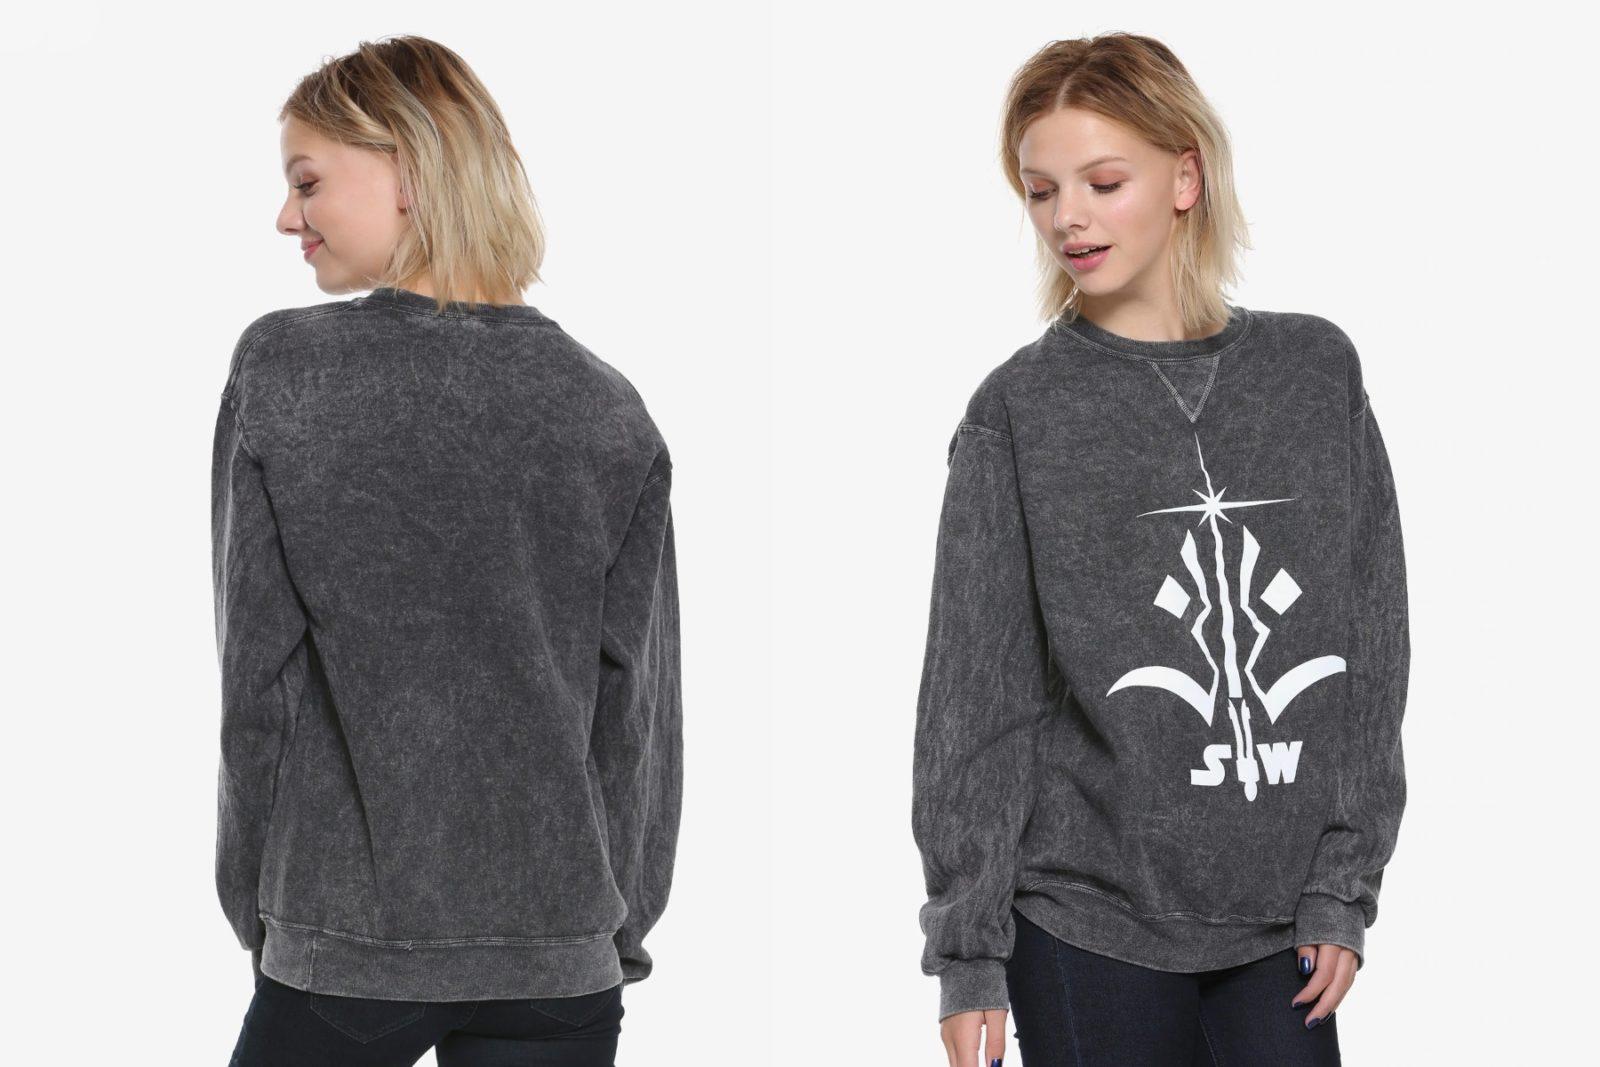 Her Universe x Star Wars The Clone Wars Logo Sweatshirt